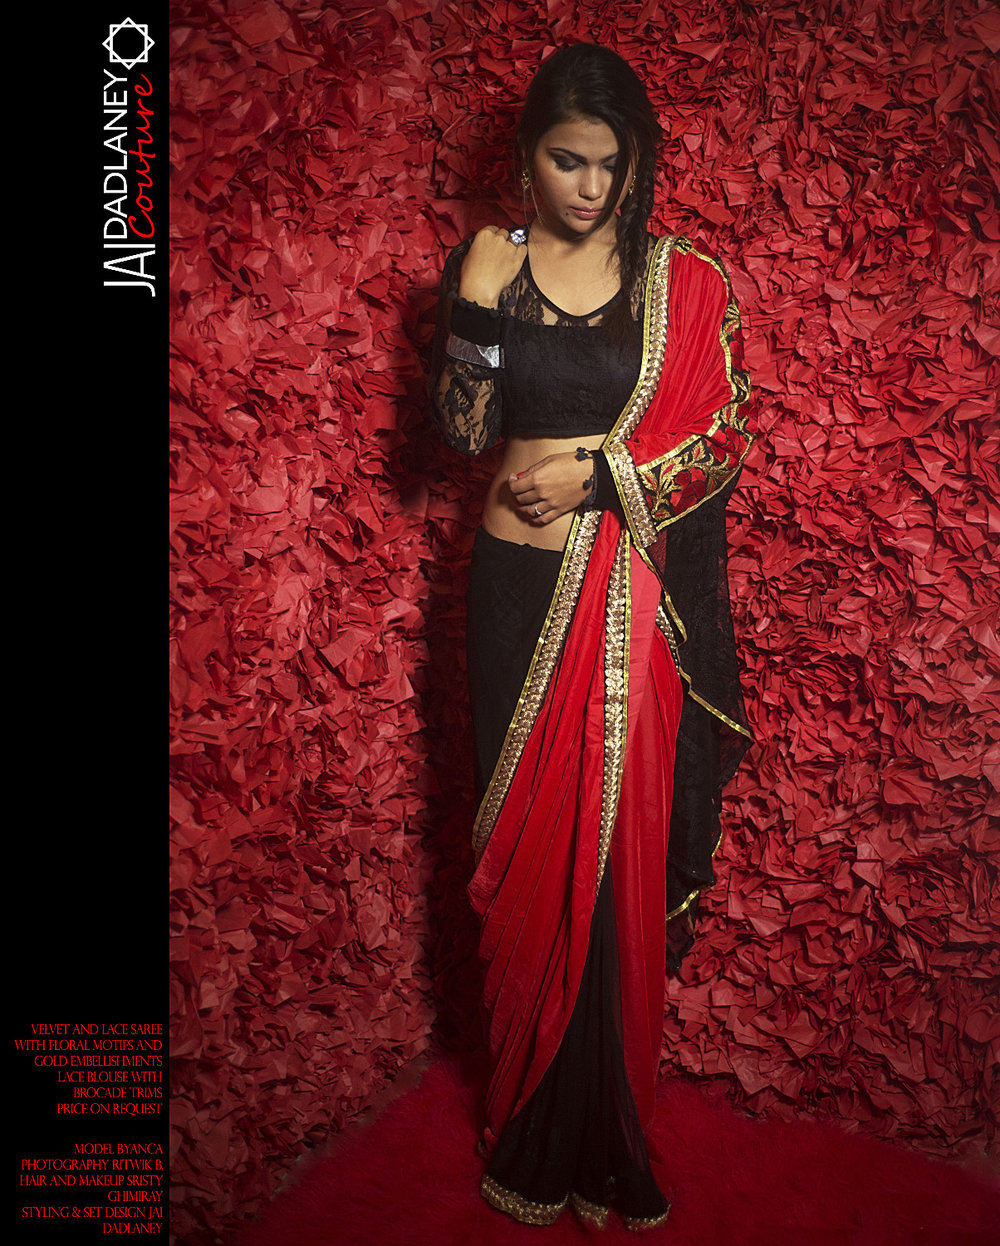 JaiDadlaneyCouture - Byanca - Ritwik Bhattacharjee